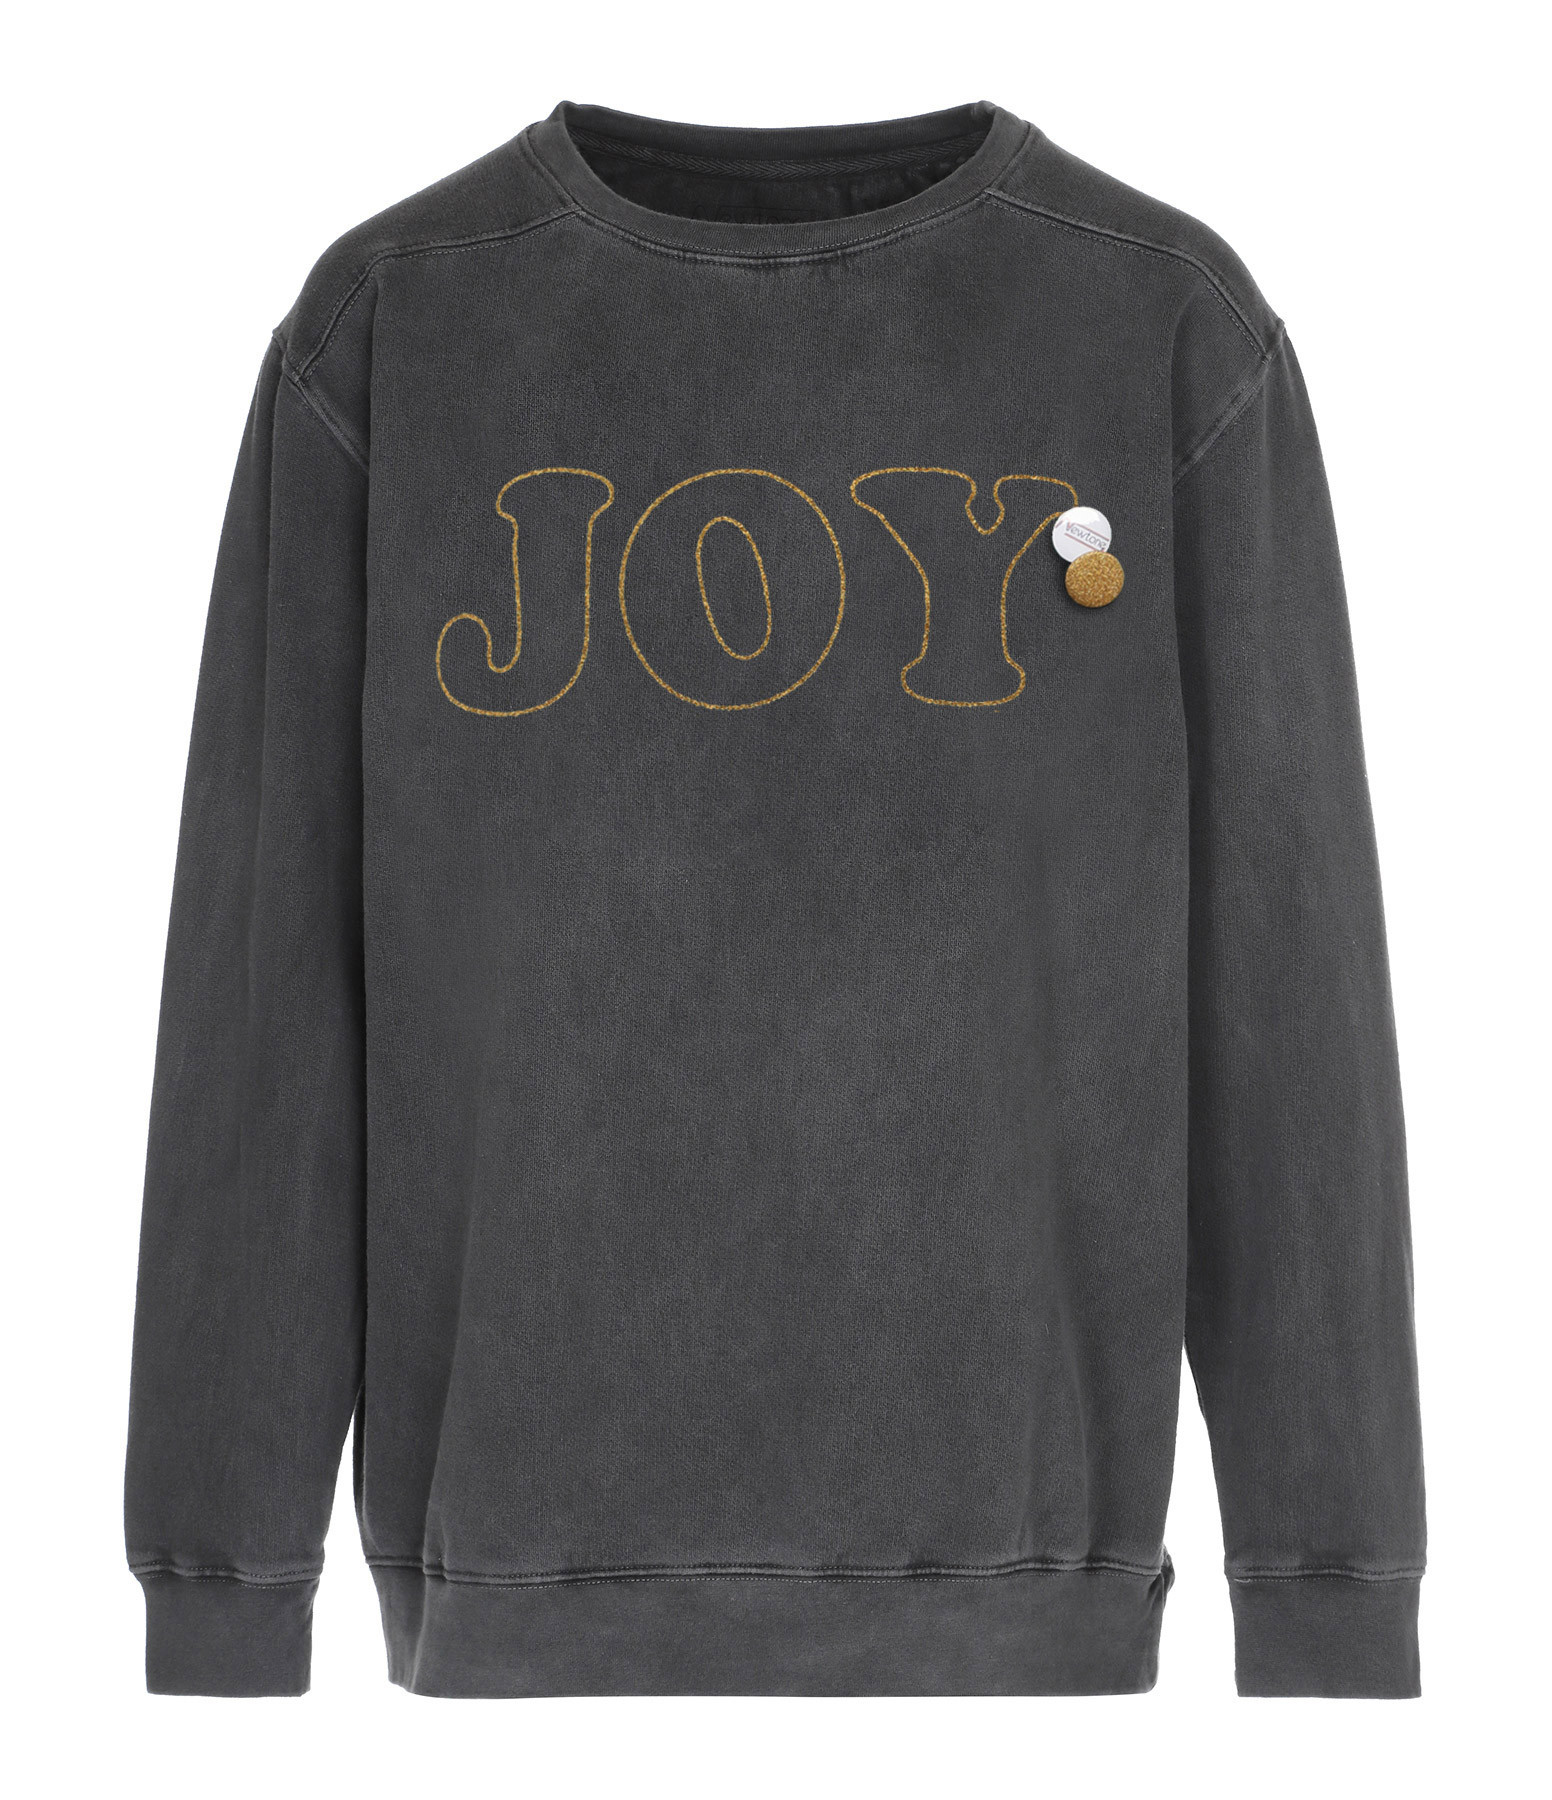 NEWTONE - Sweatshirt Roller Joy Coton Pepper Glitter